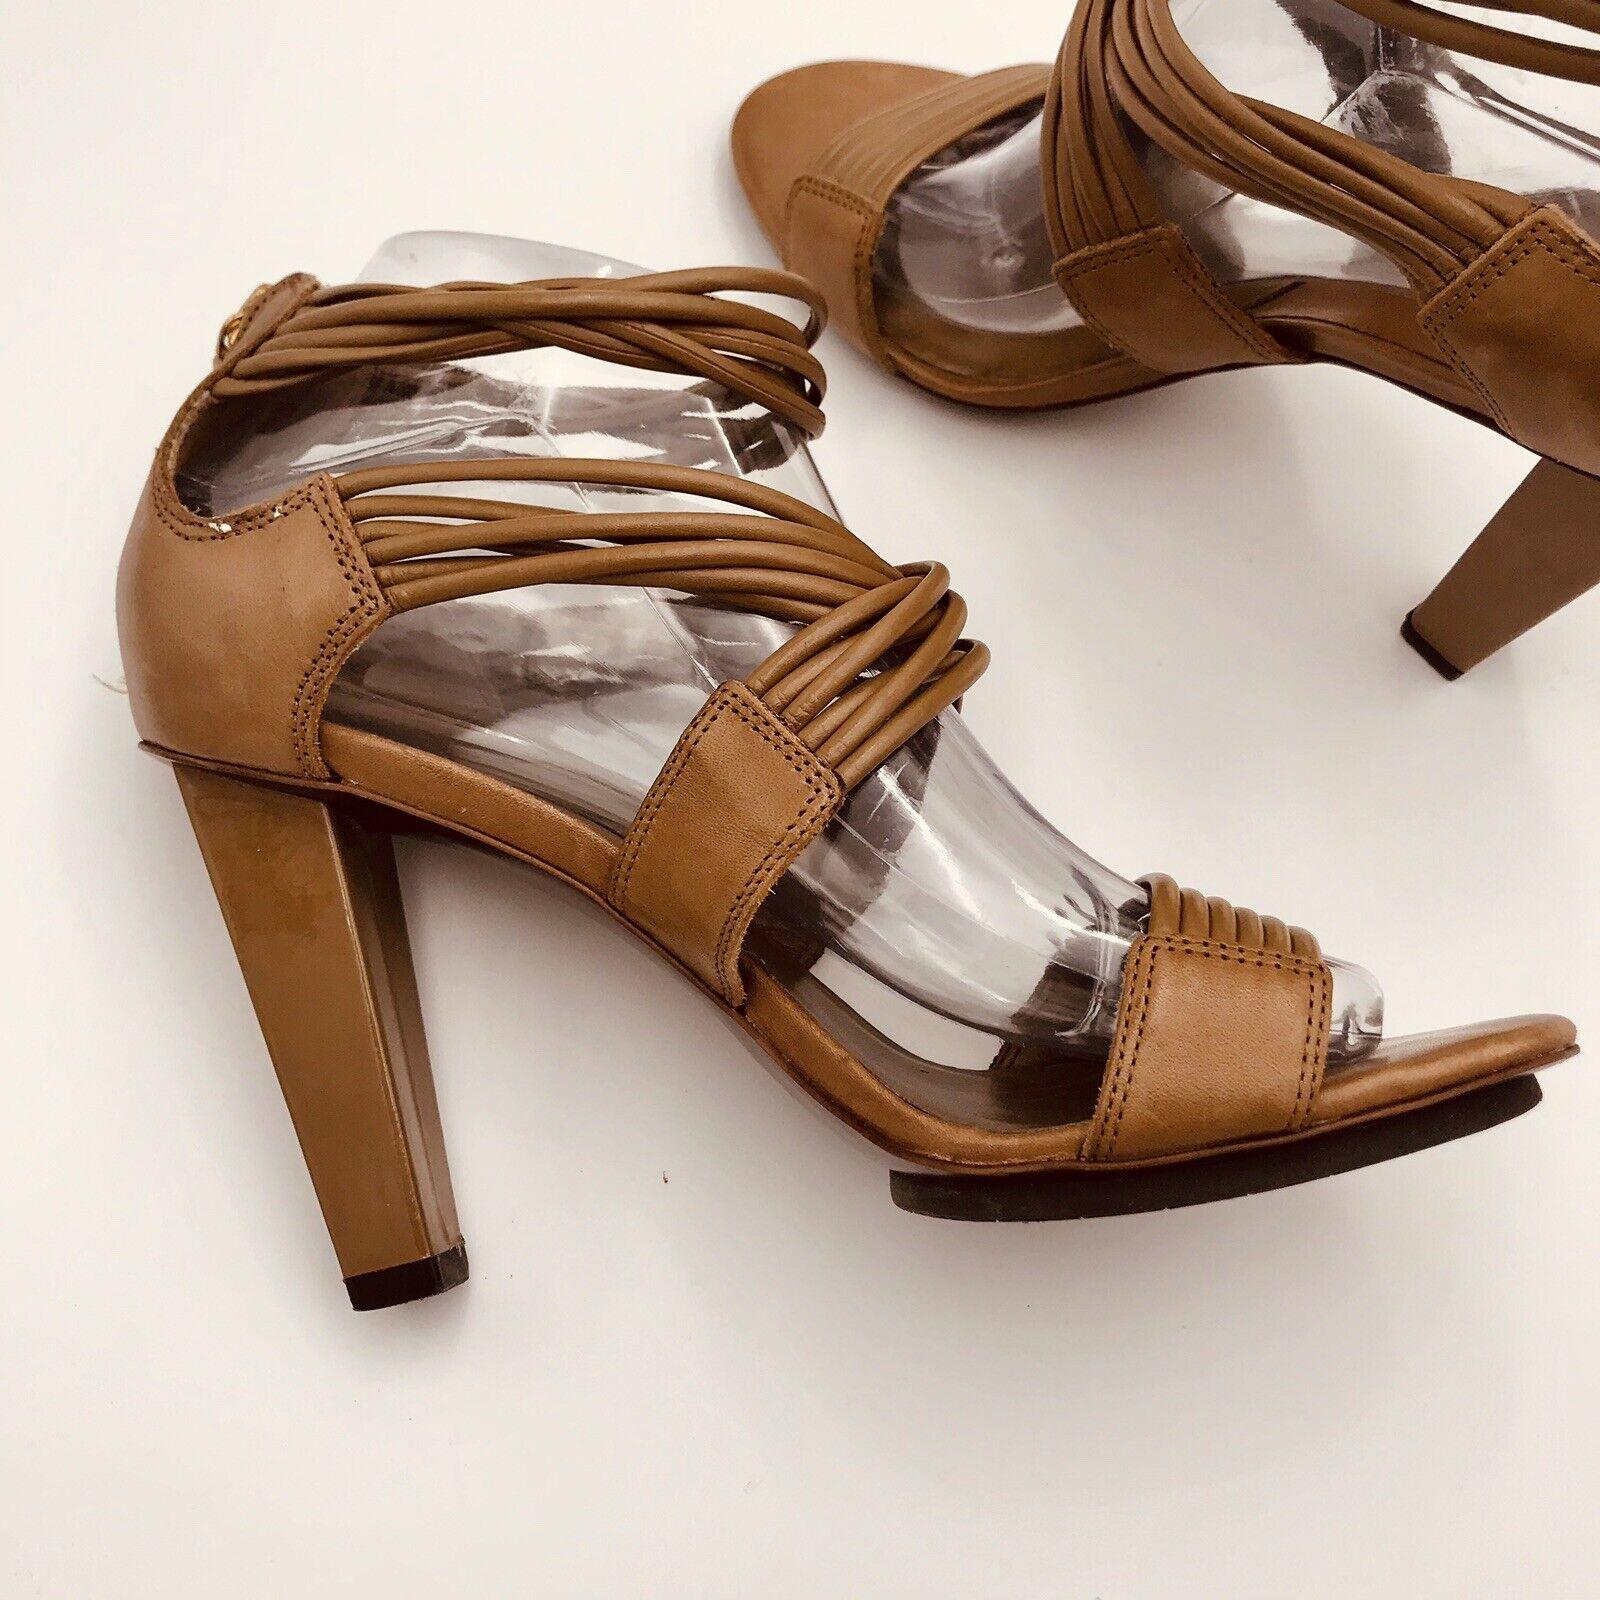 Diane Von Furstenberg 8 Medium High Heel Heel Heel marrón Gladiator Sandal Zipper Back EUC  descuentos y mas